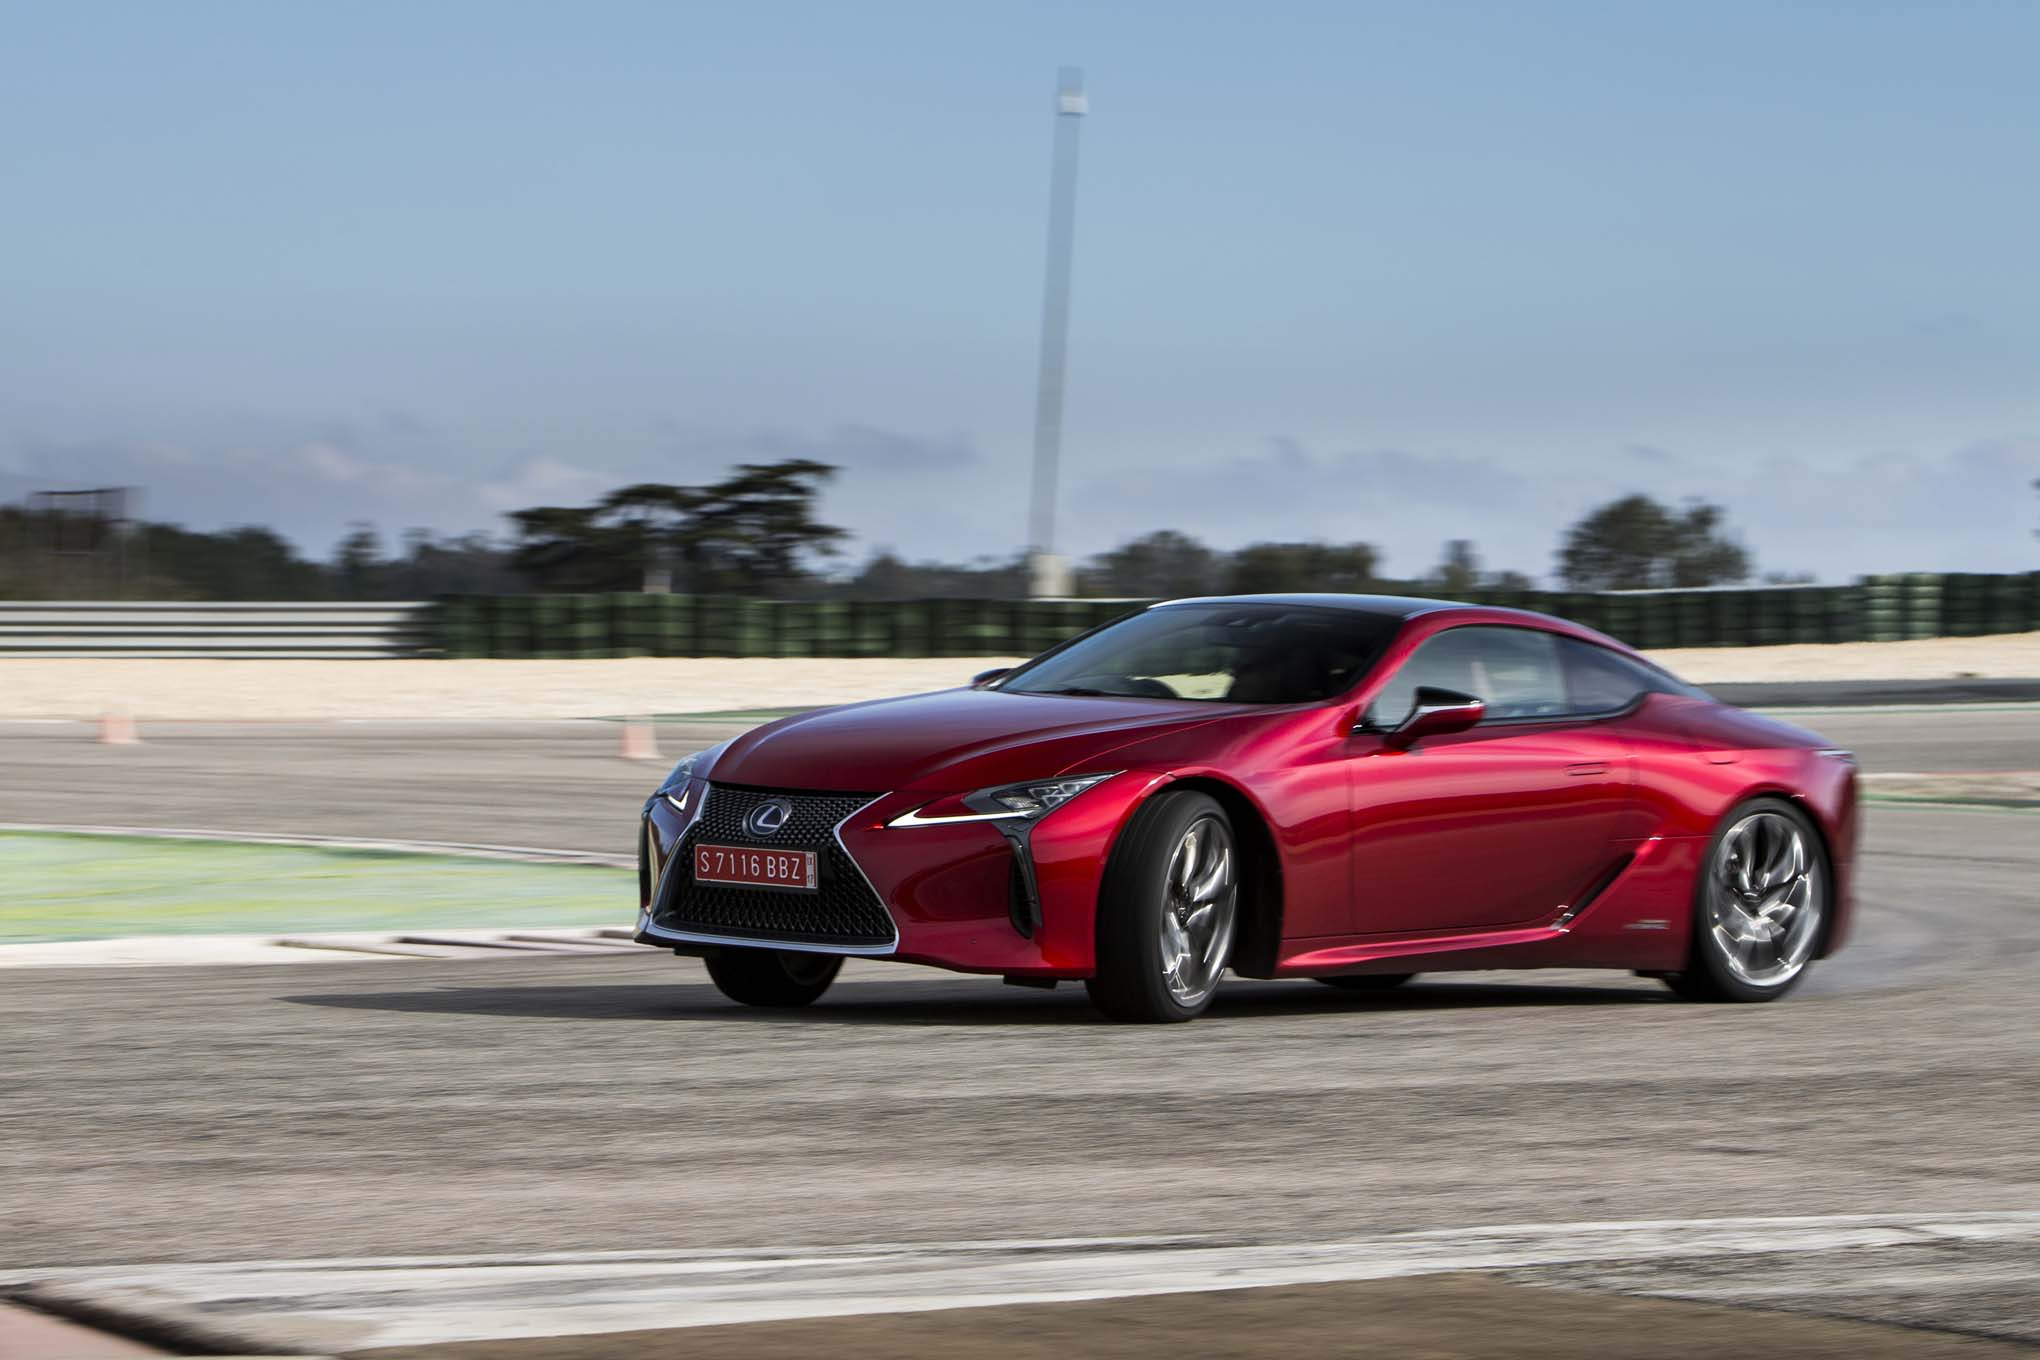 http://st.automobilemag.com/uploads/sites/11/2016/12/2018-Lexus-LC-500h-front-three-quarter-in-motion-05.jpg